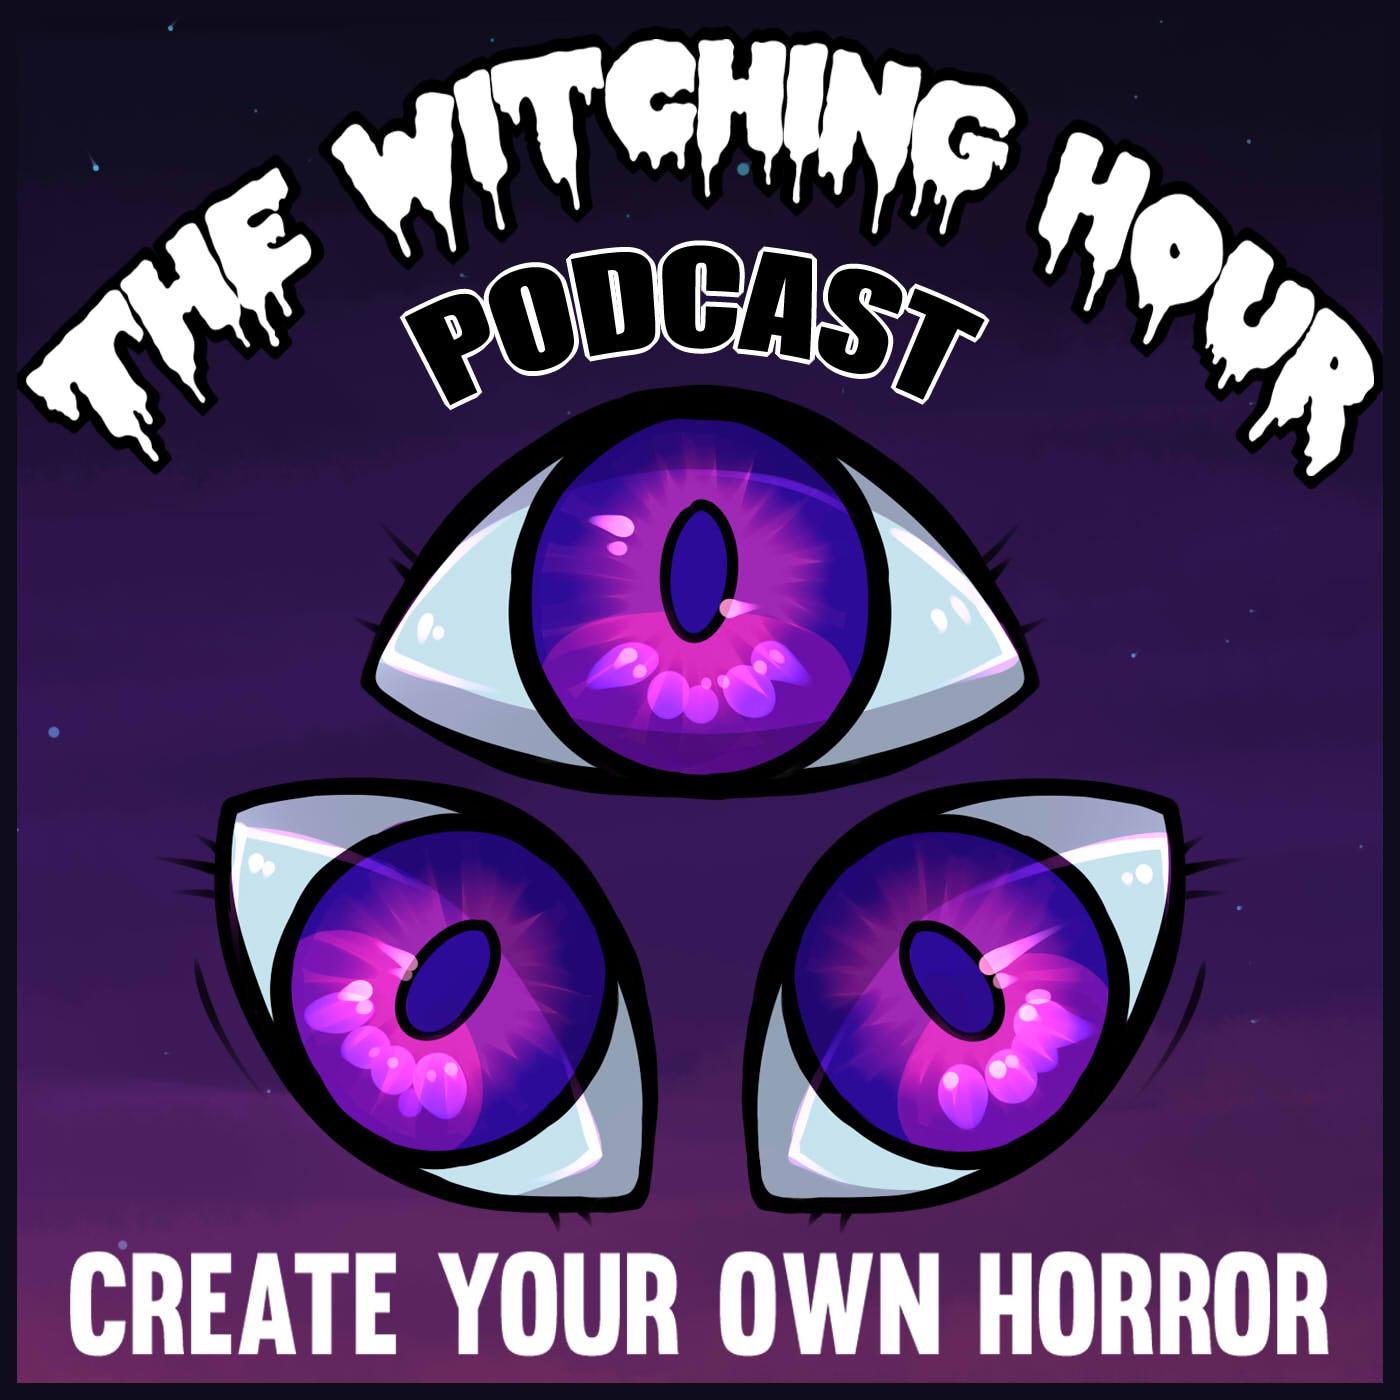 witchinghourpodcast_creativehorror_bonus02